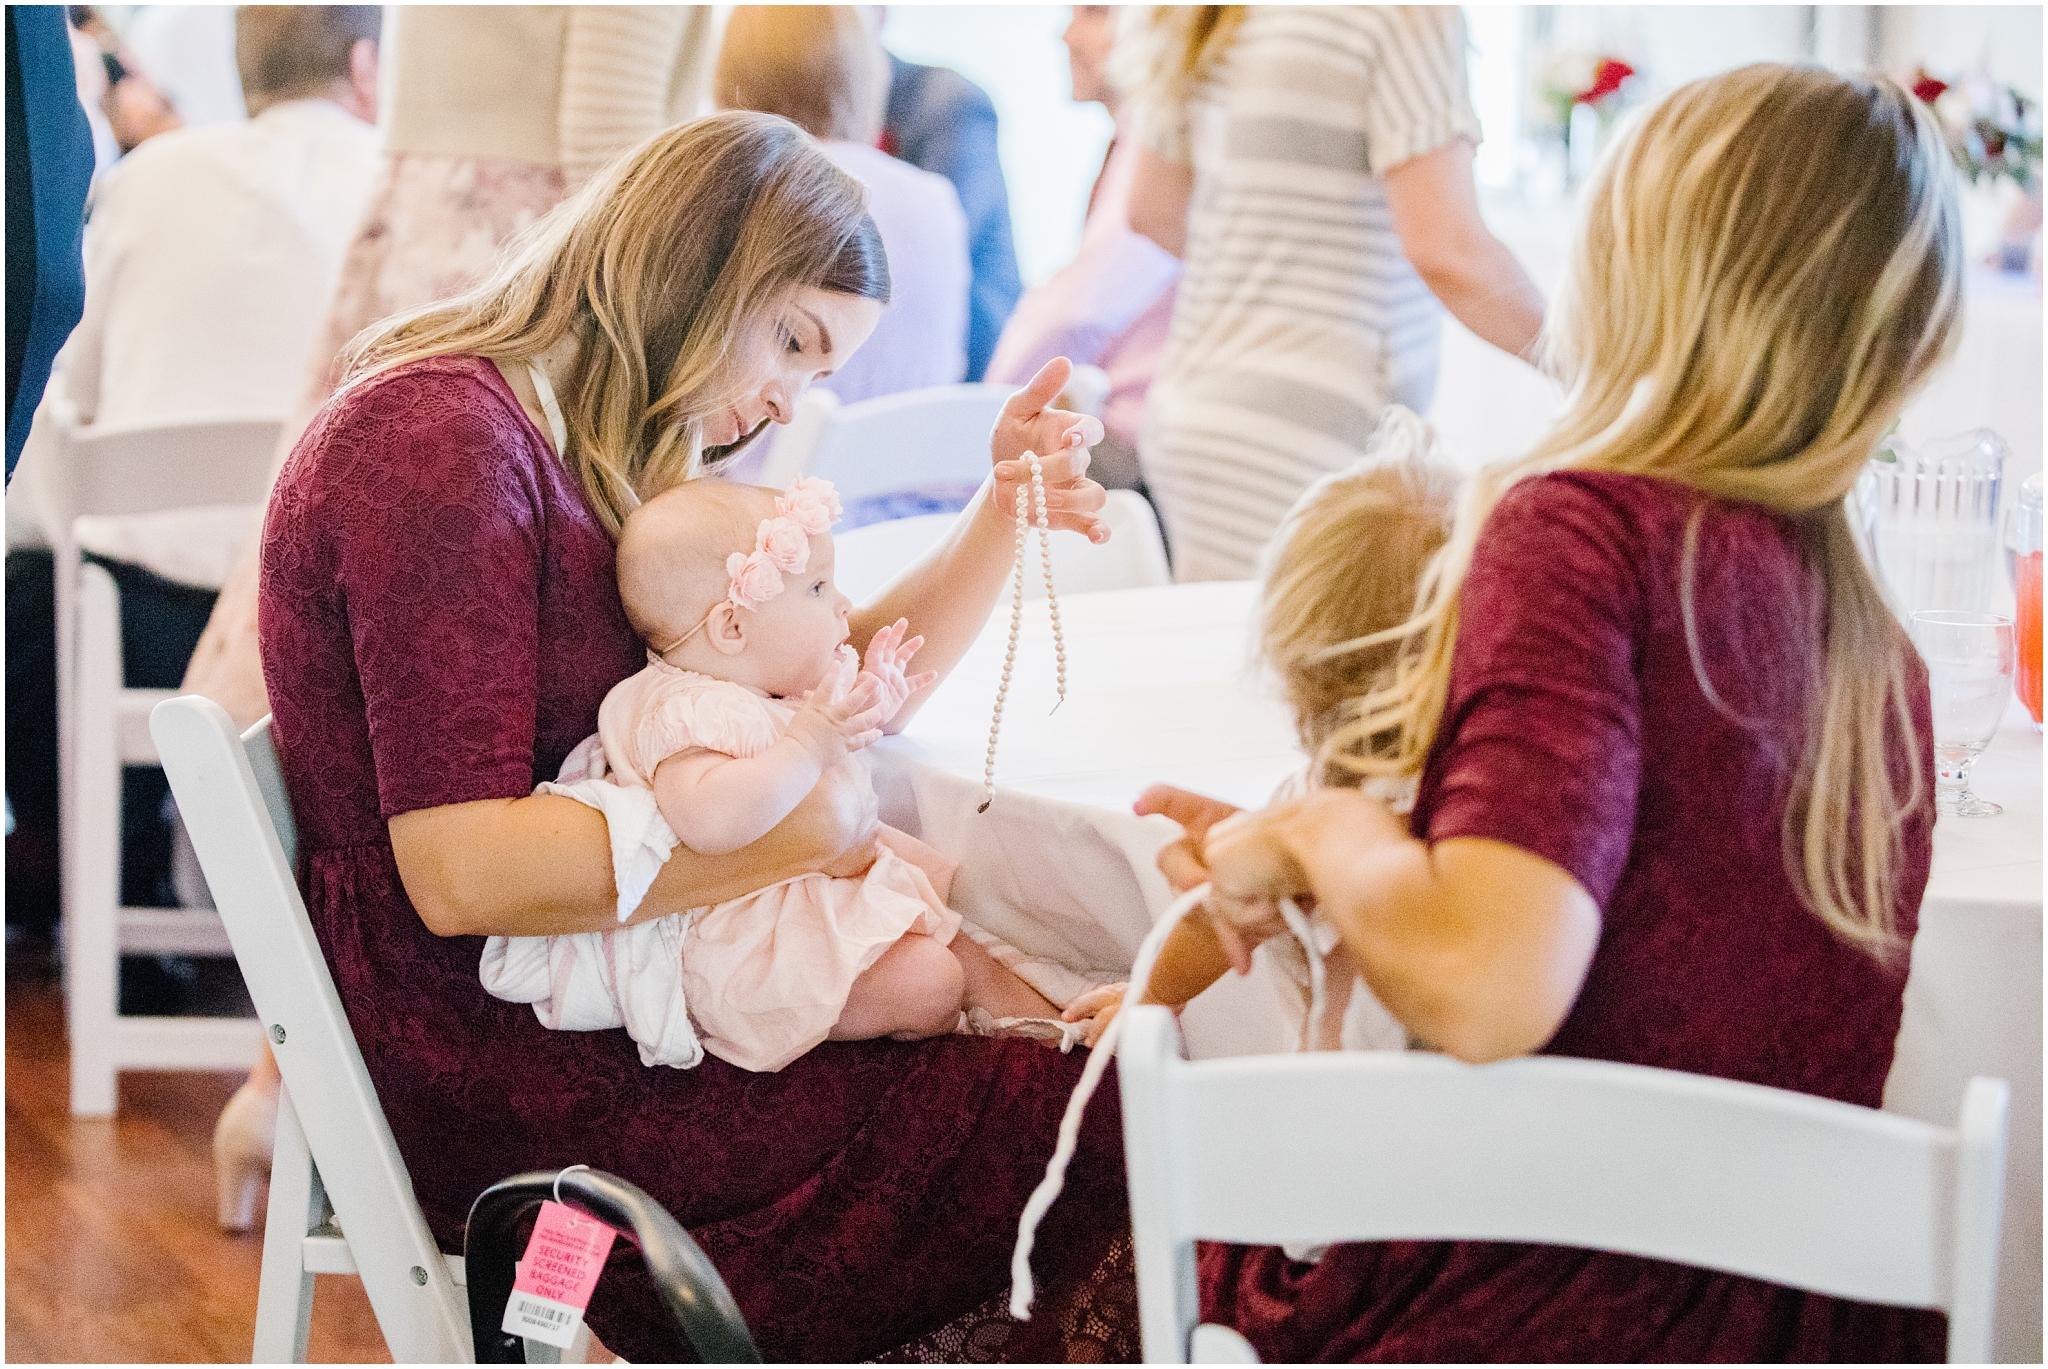 HannahChaseWedding-261_Lizzie-B-Imagery-Utah-Wedding-Photographer-Park-City-Salt-Lake-City-Payson-Temple-Clarion-Garden-Center.jpg